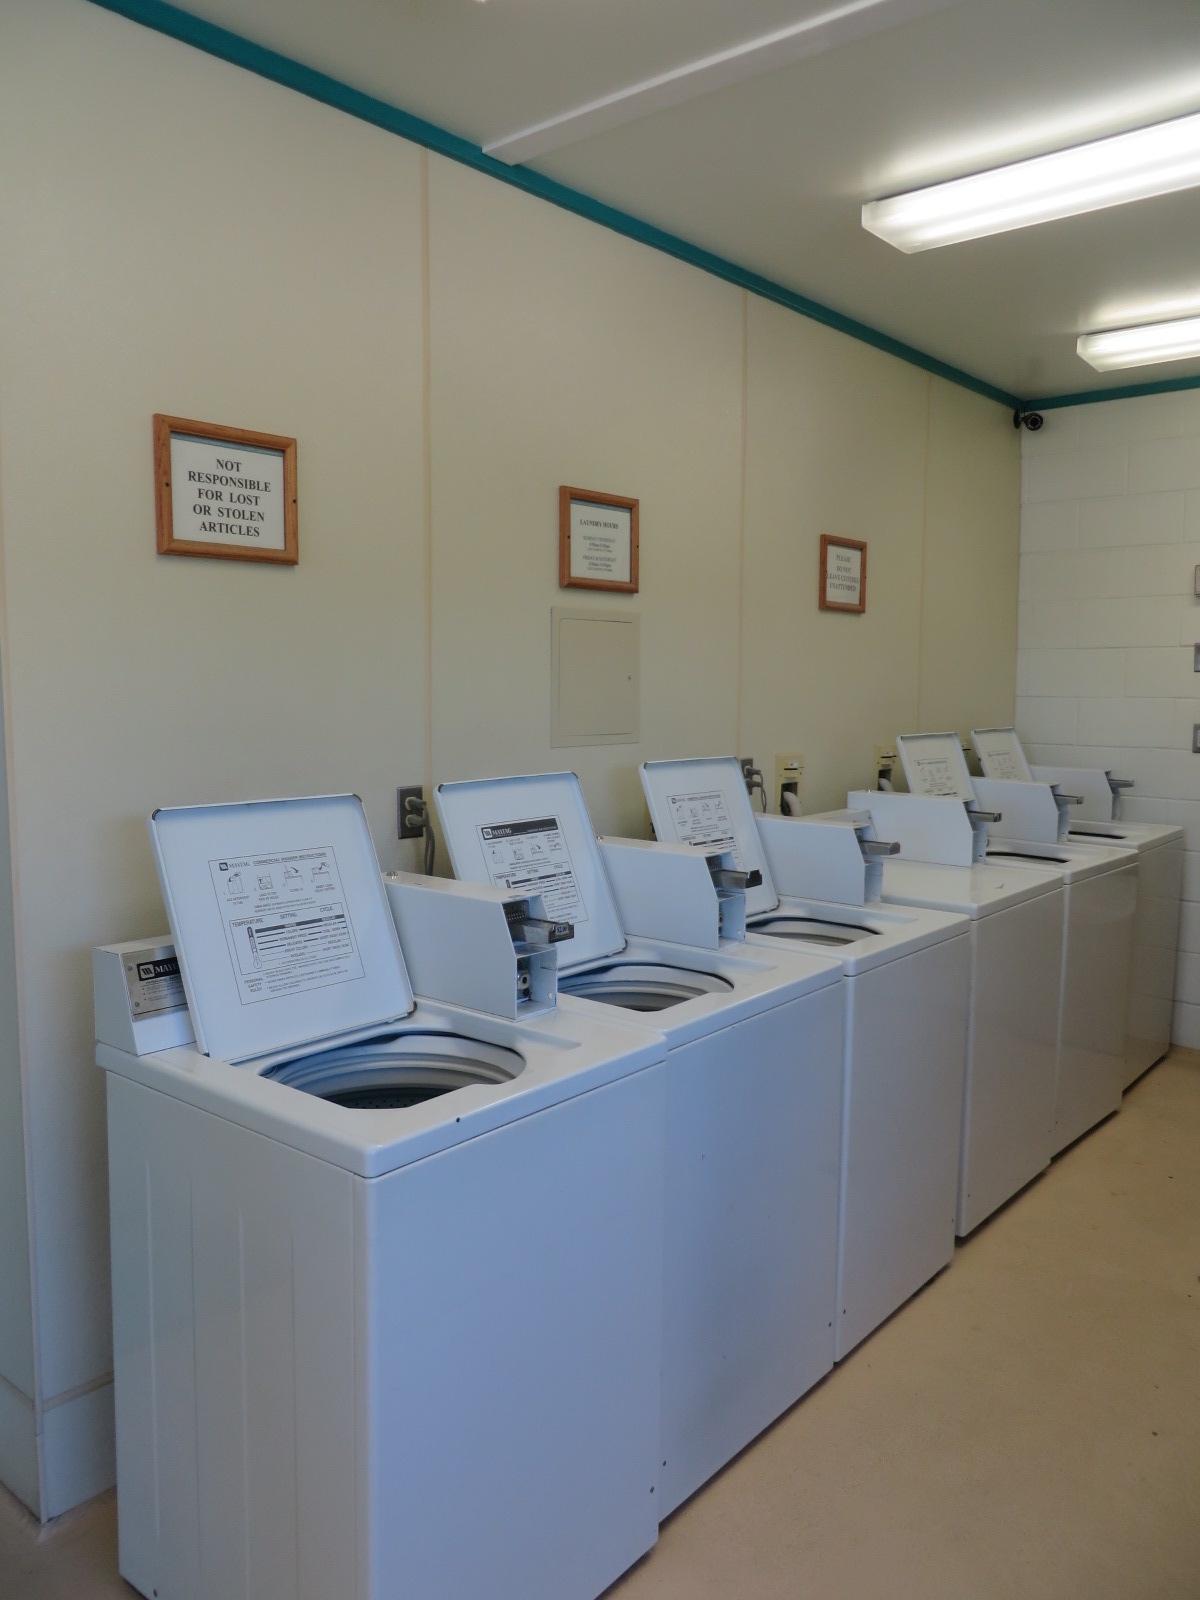 single load laundry machines